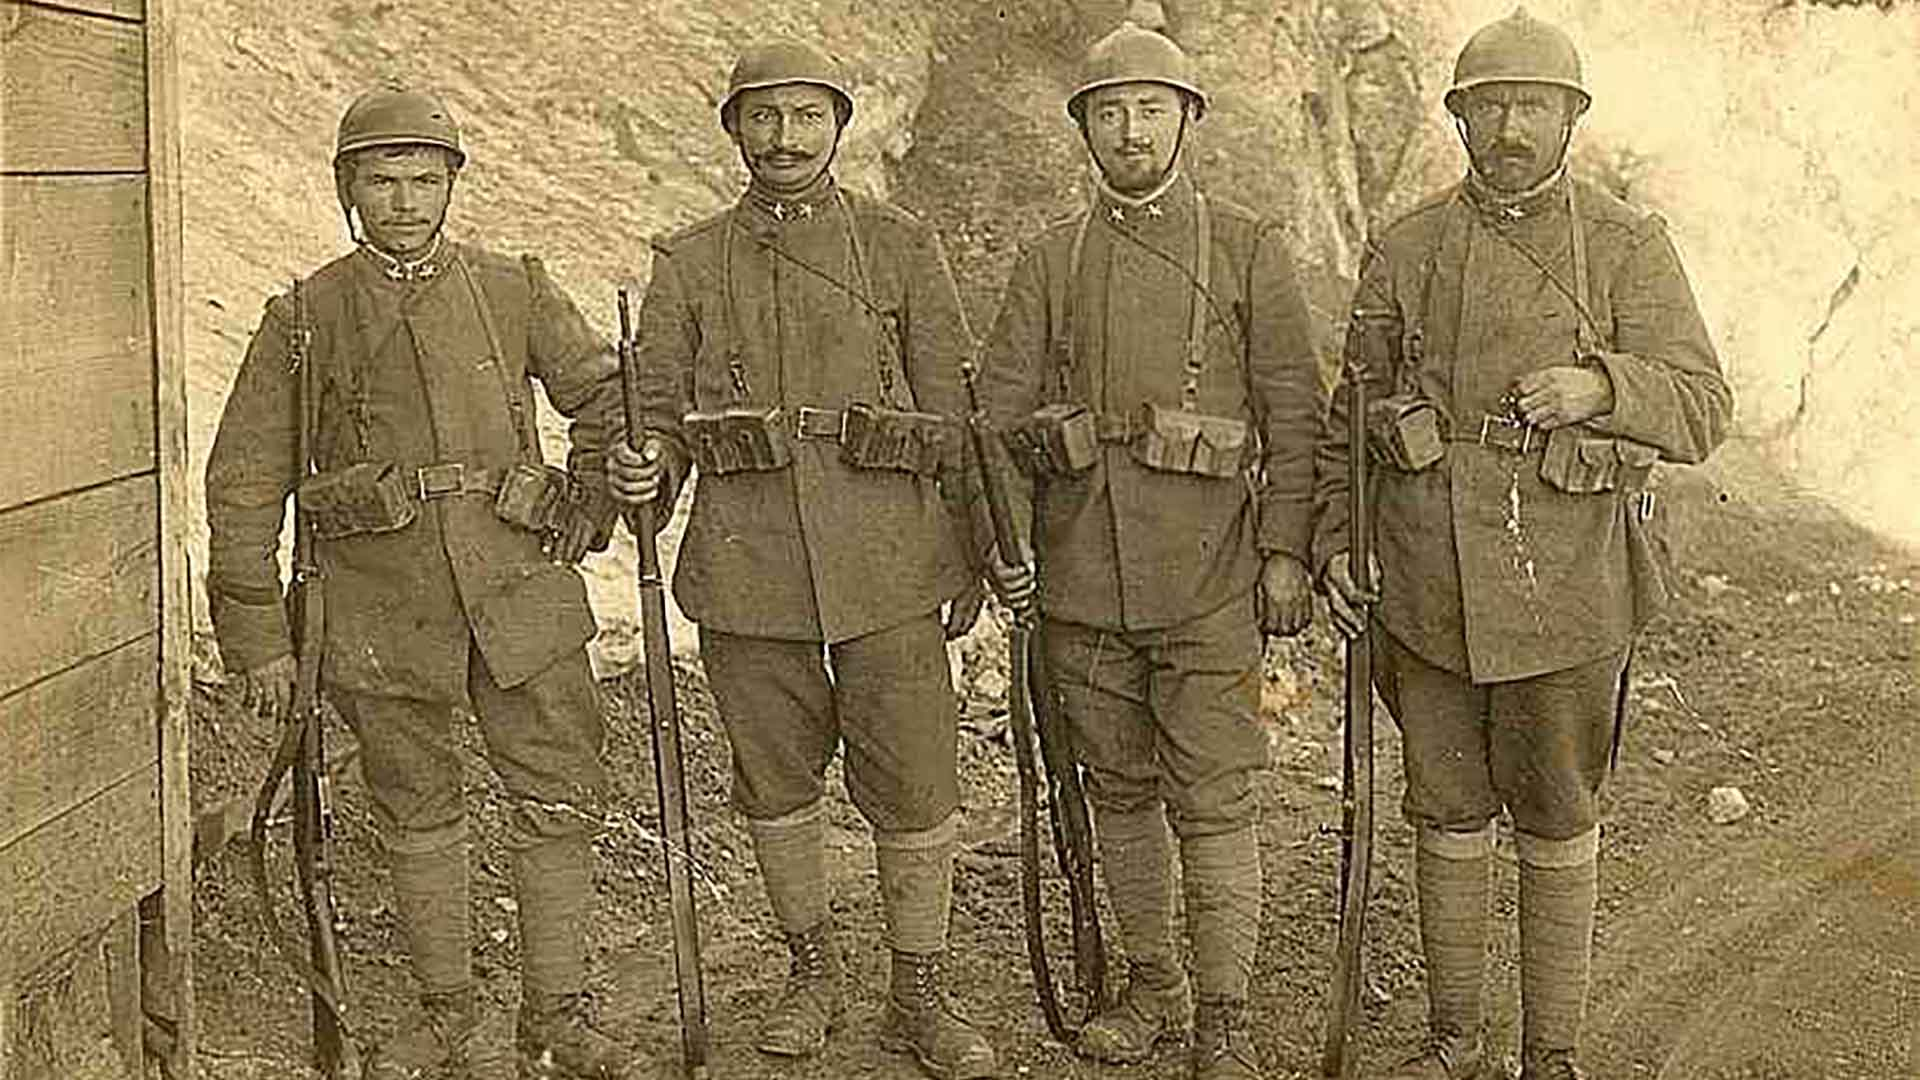 Soldati Semplici